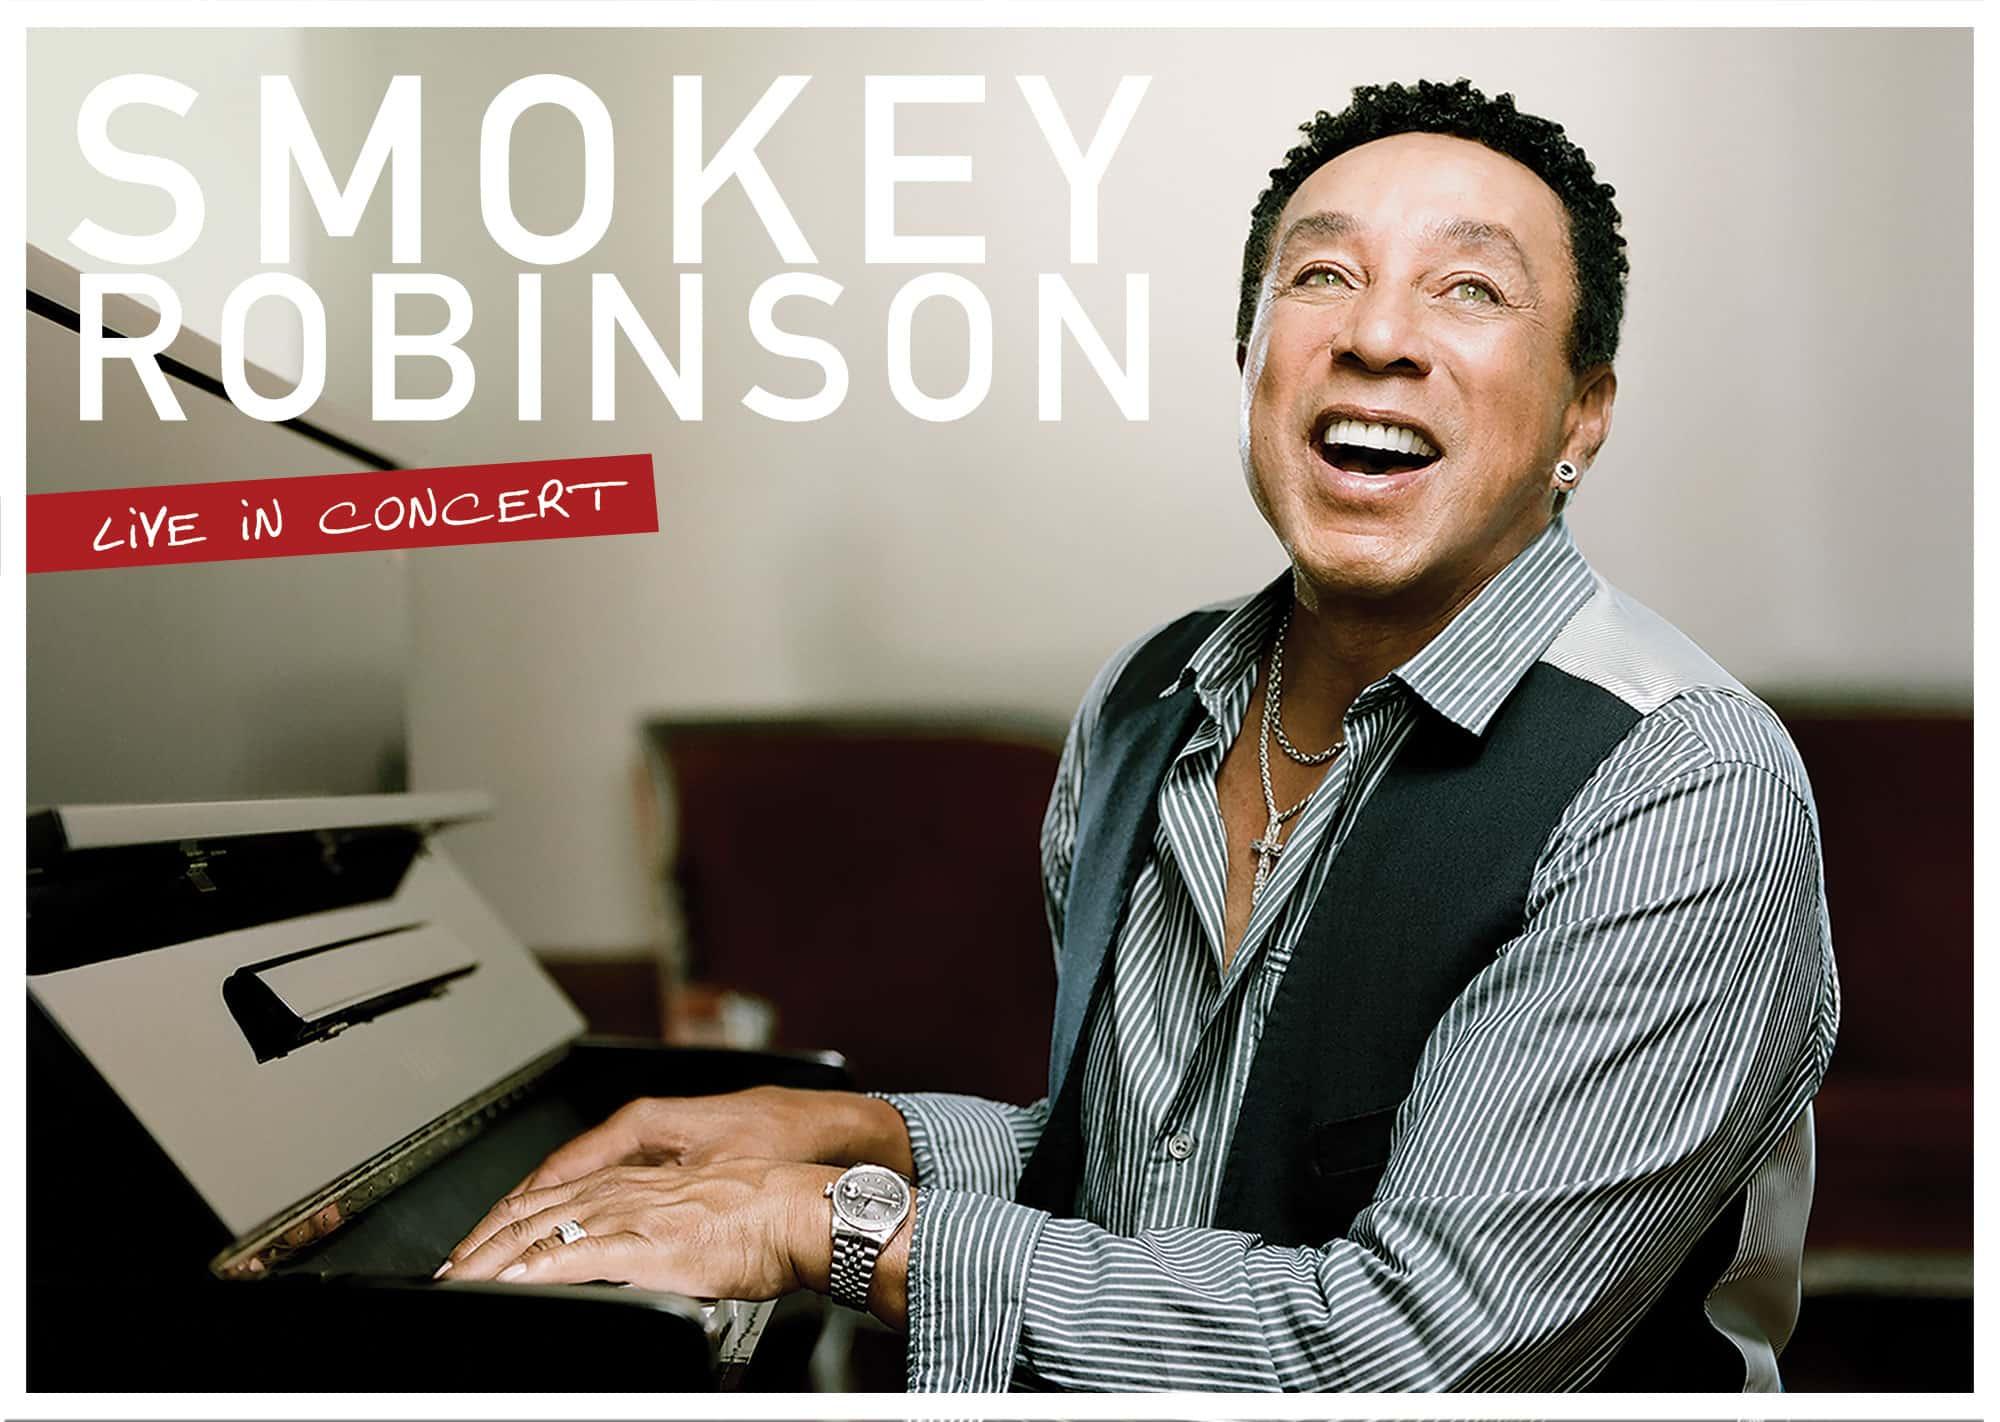 Smokey Robinson Live In Concert